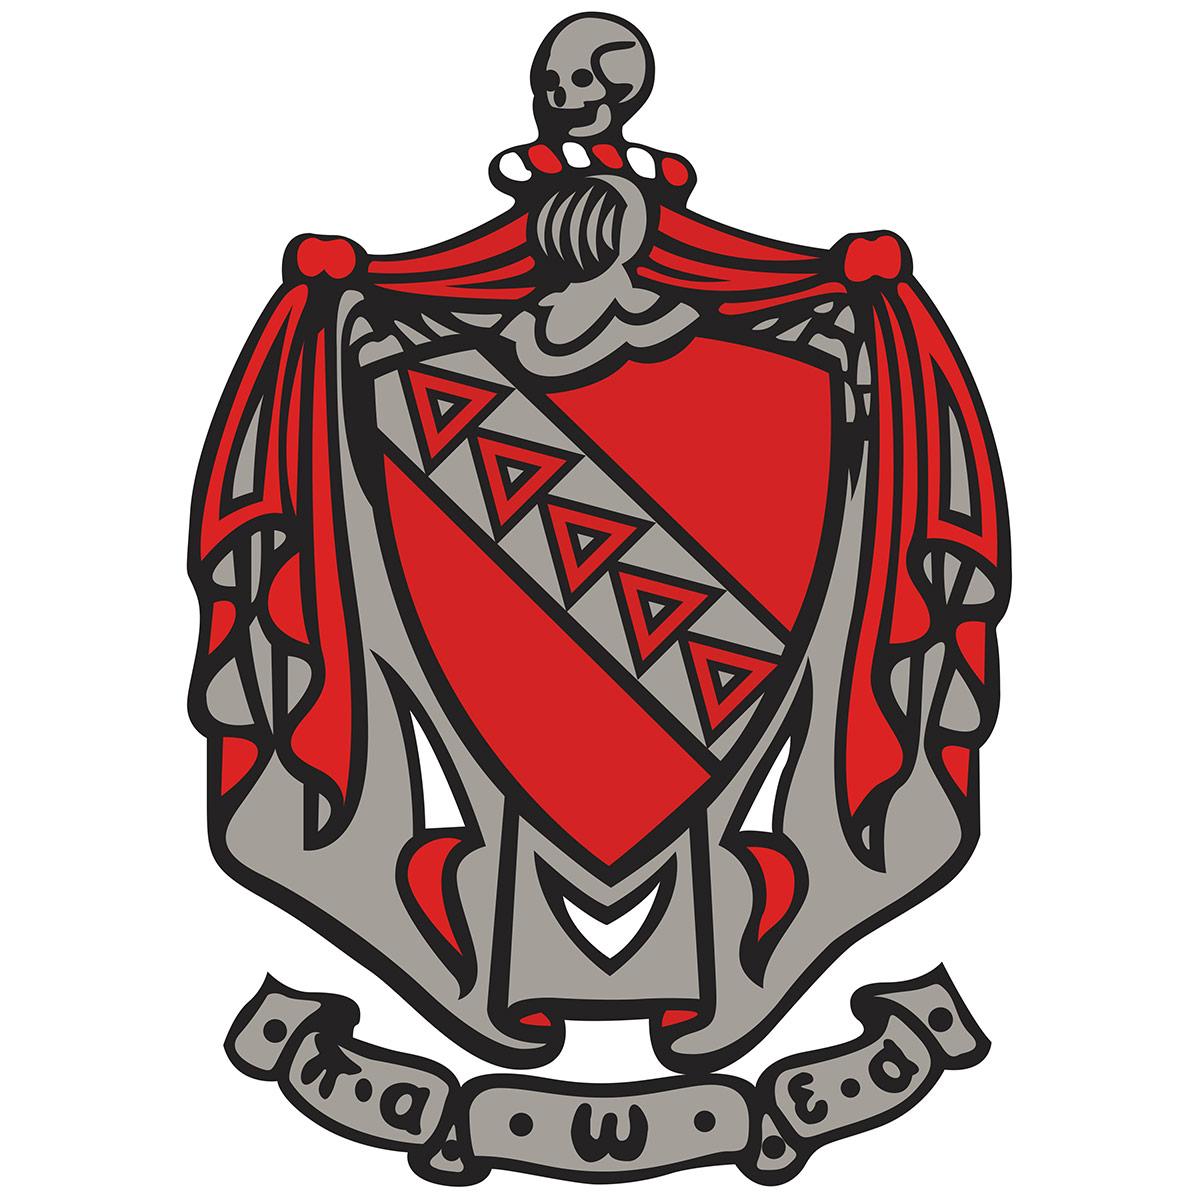 Tau Kappa Epsilon Crest